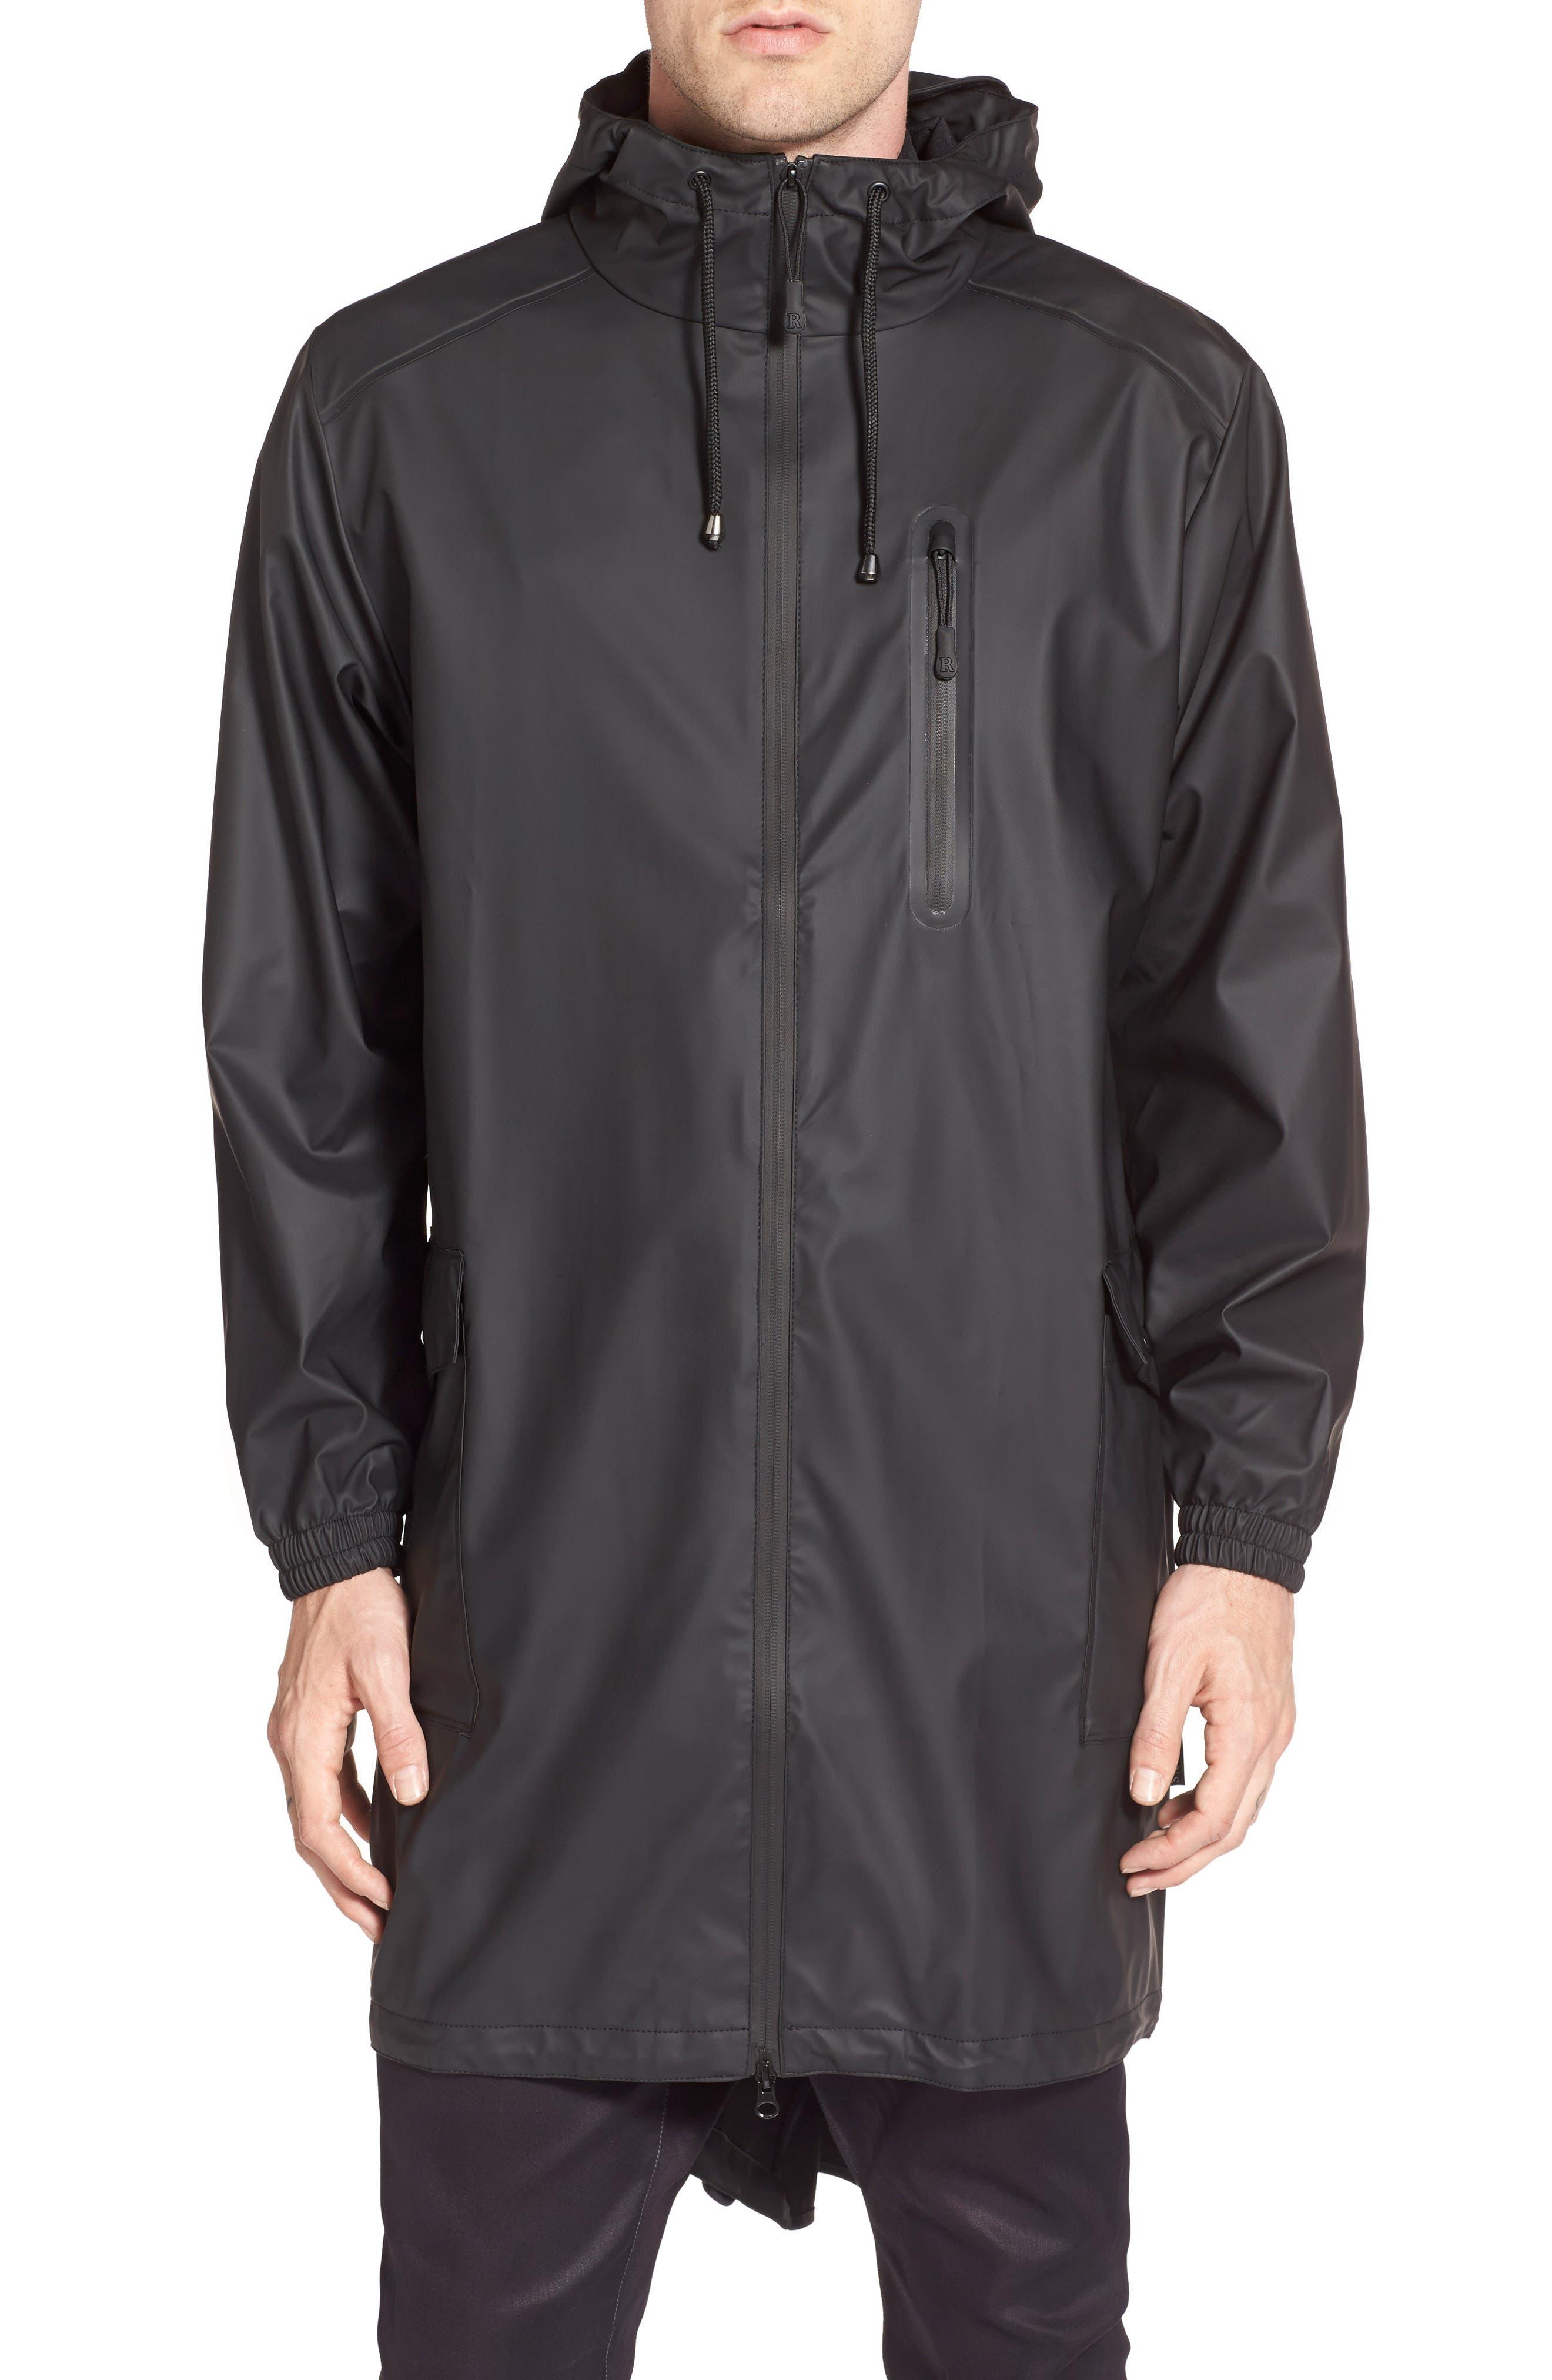 Waterproof Parka Coat,                             Main thumbnail 1, color,                             BLACK